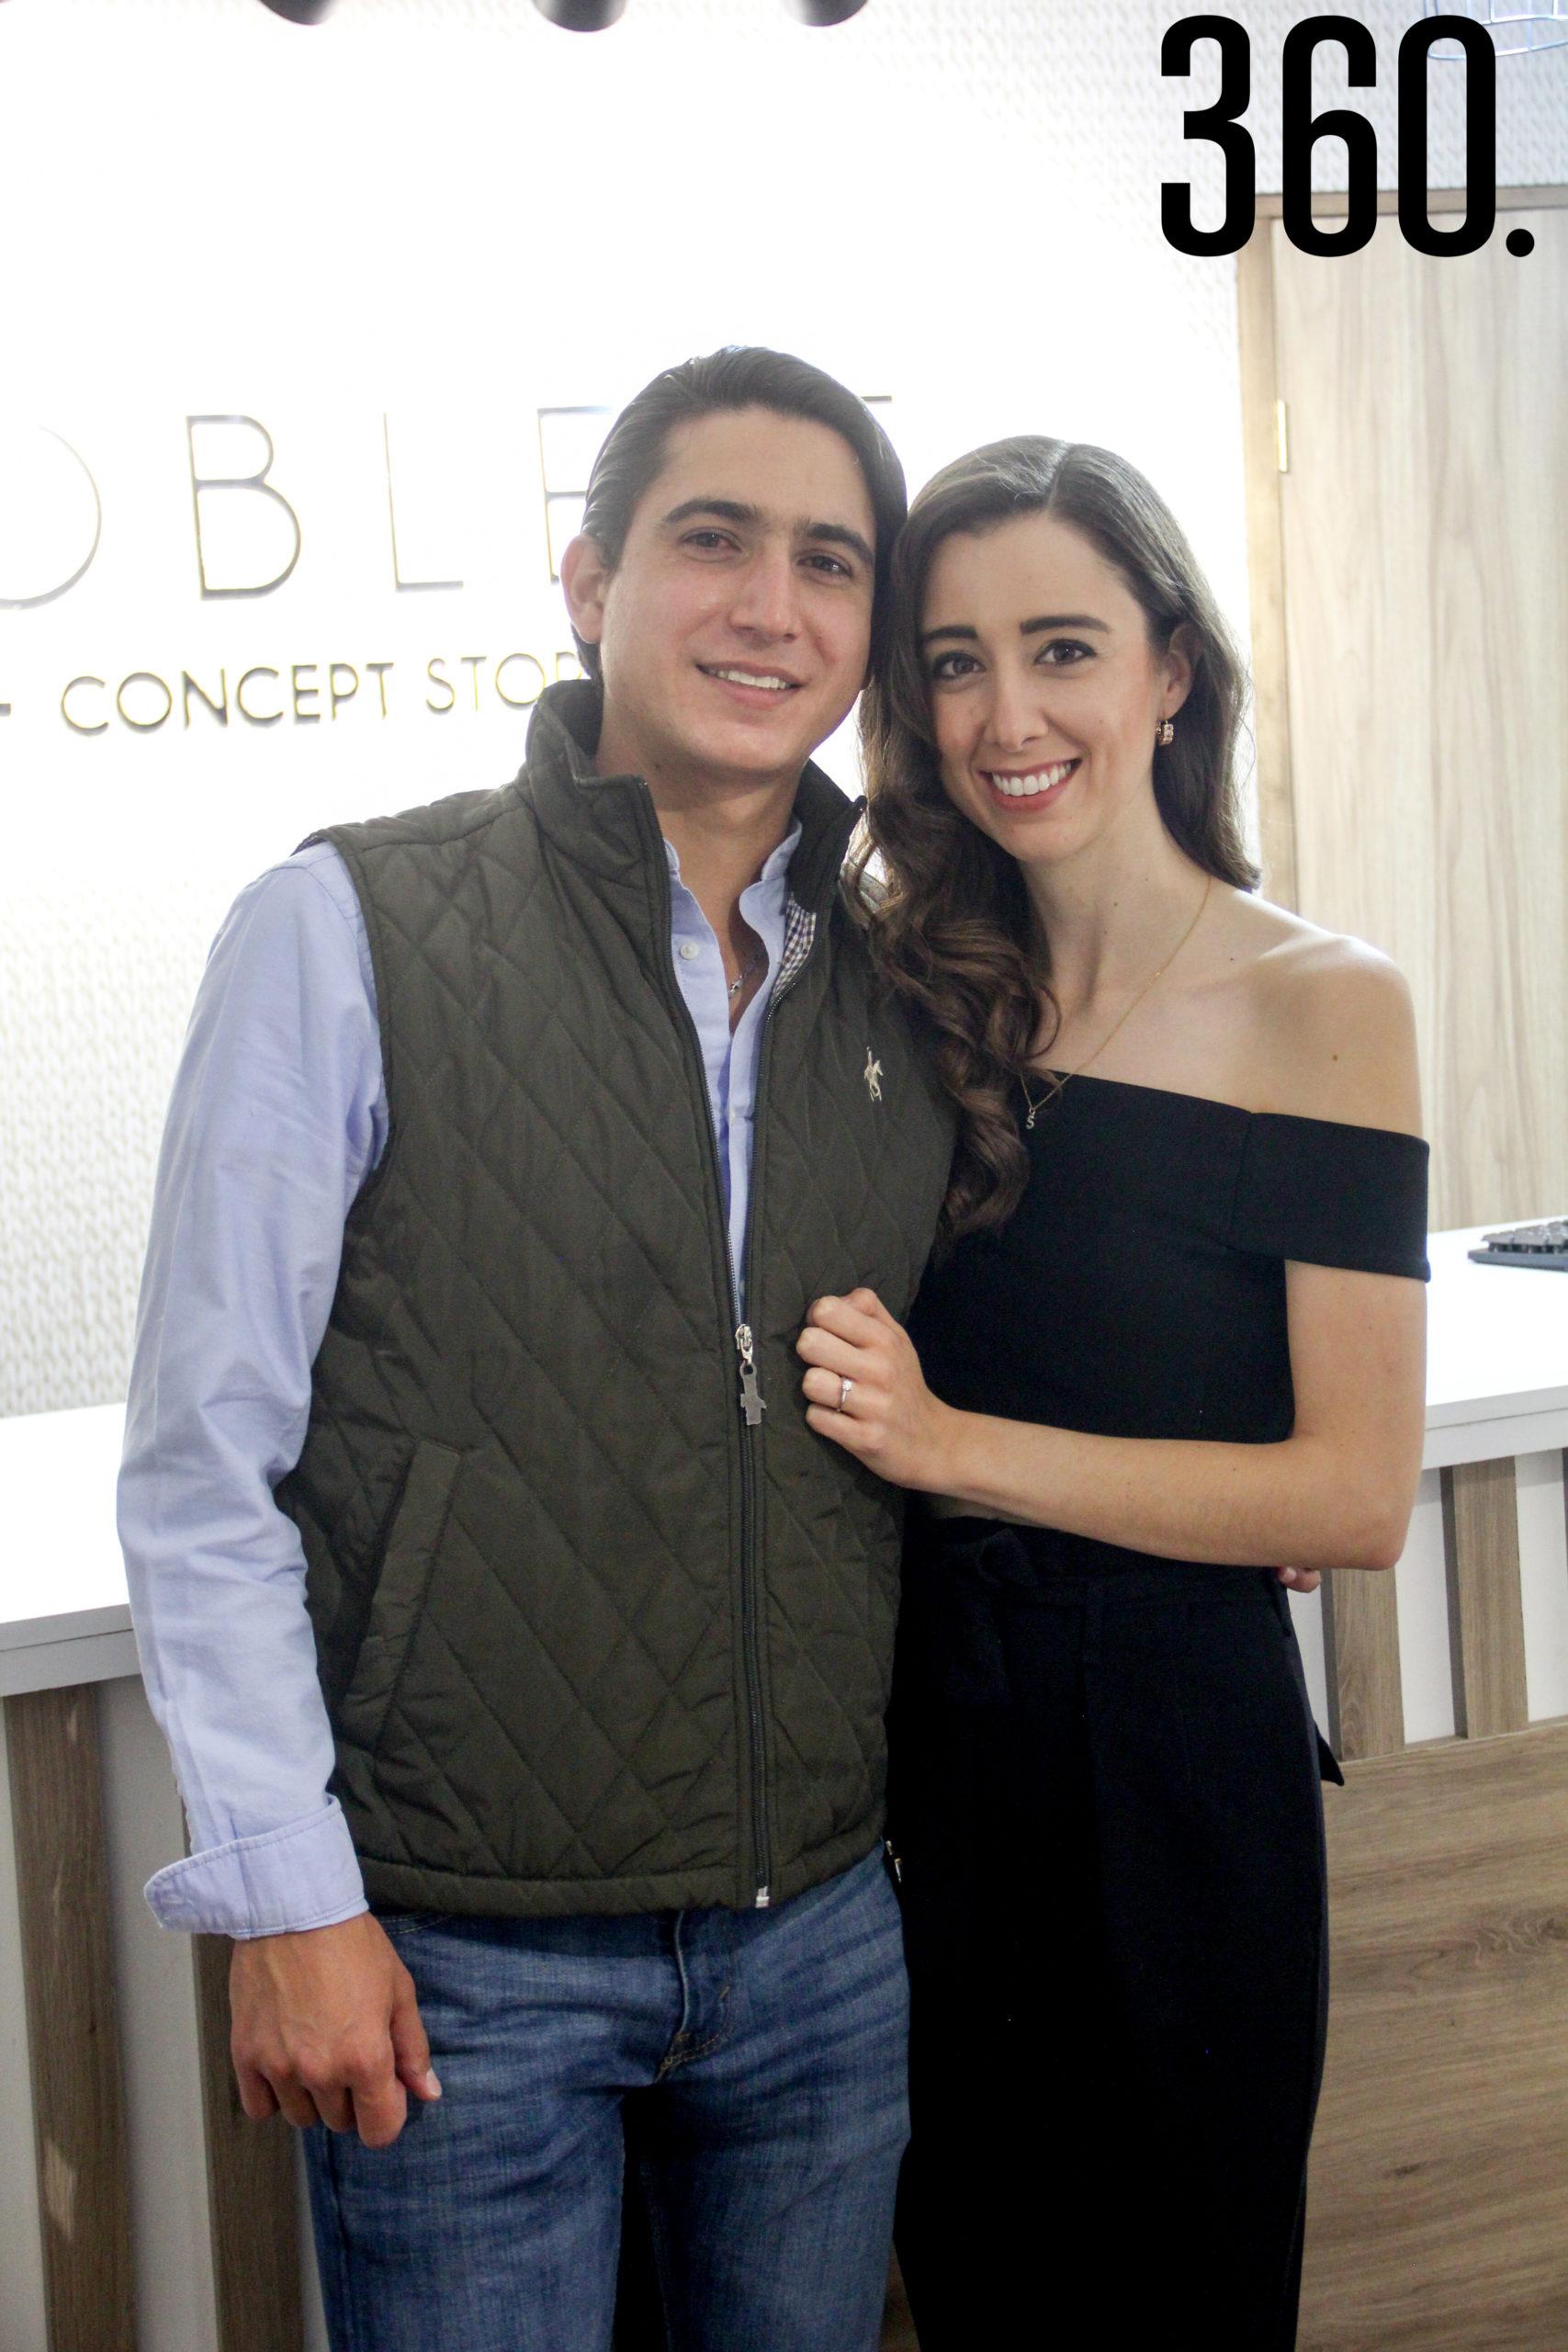 Roberto Treviño y Sofía Elguezabal.